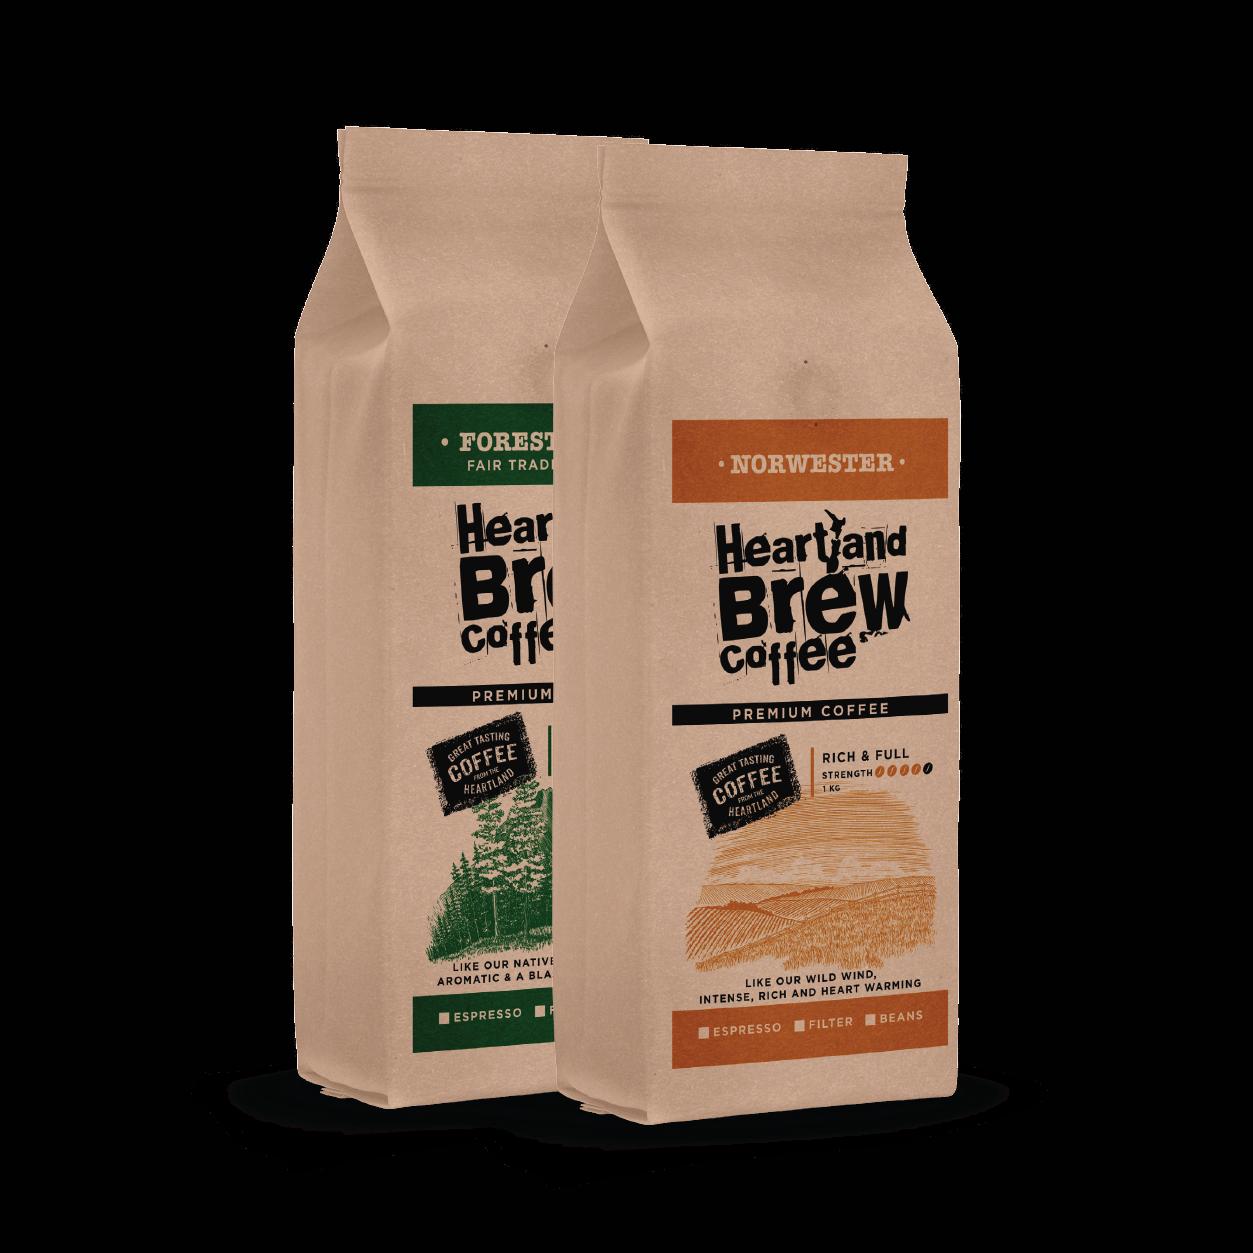 Heartland Brew Coffee Packaging